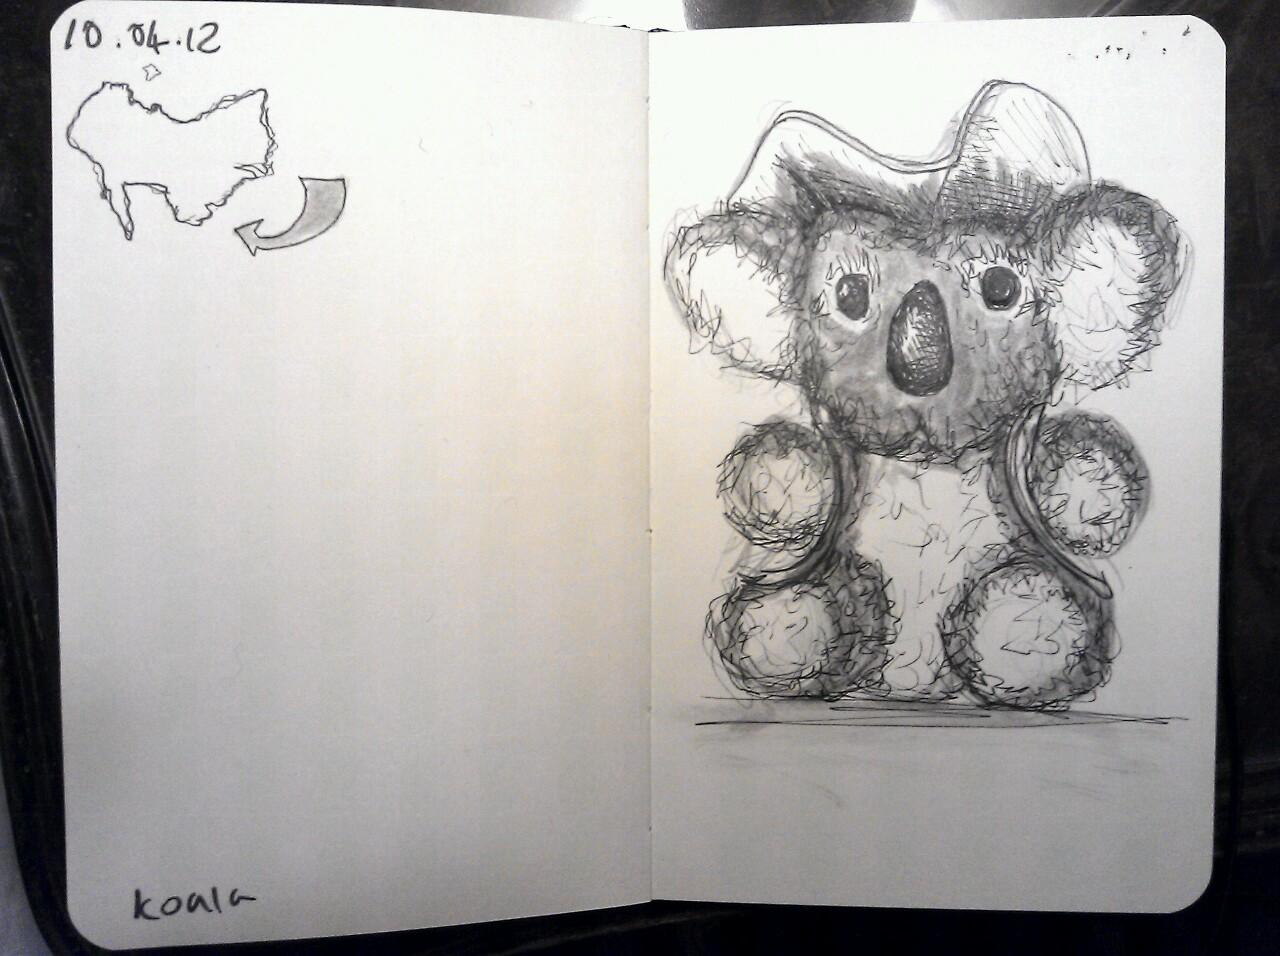 365 drawings later … day 70 … koala